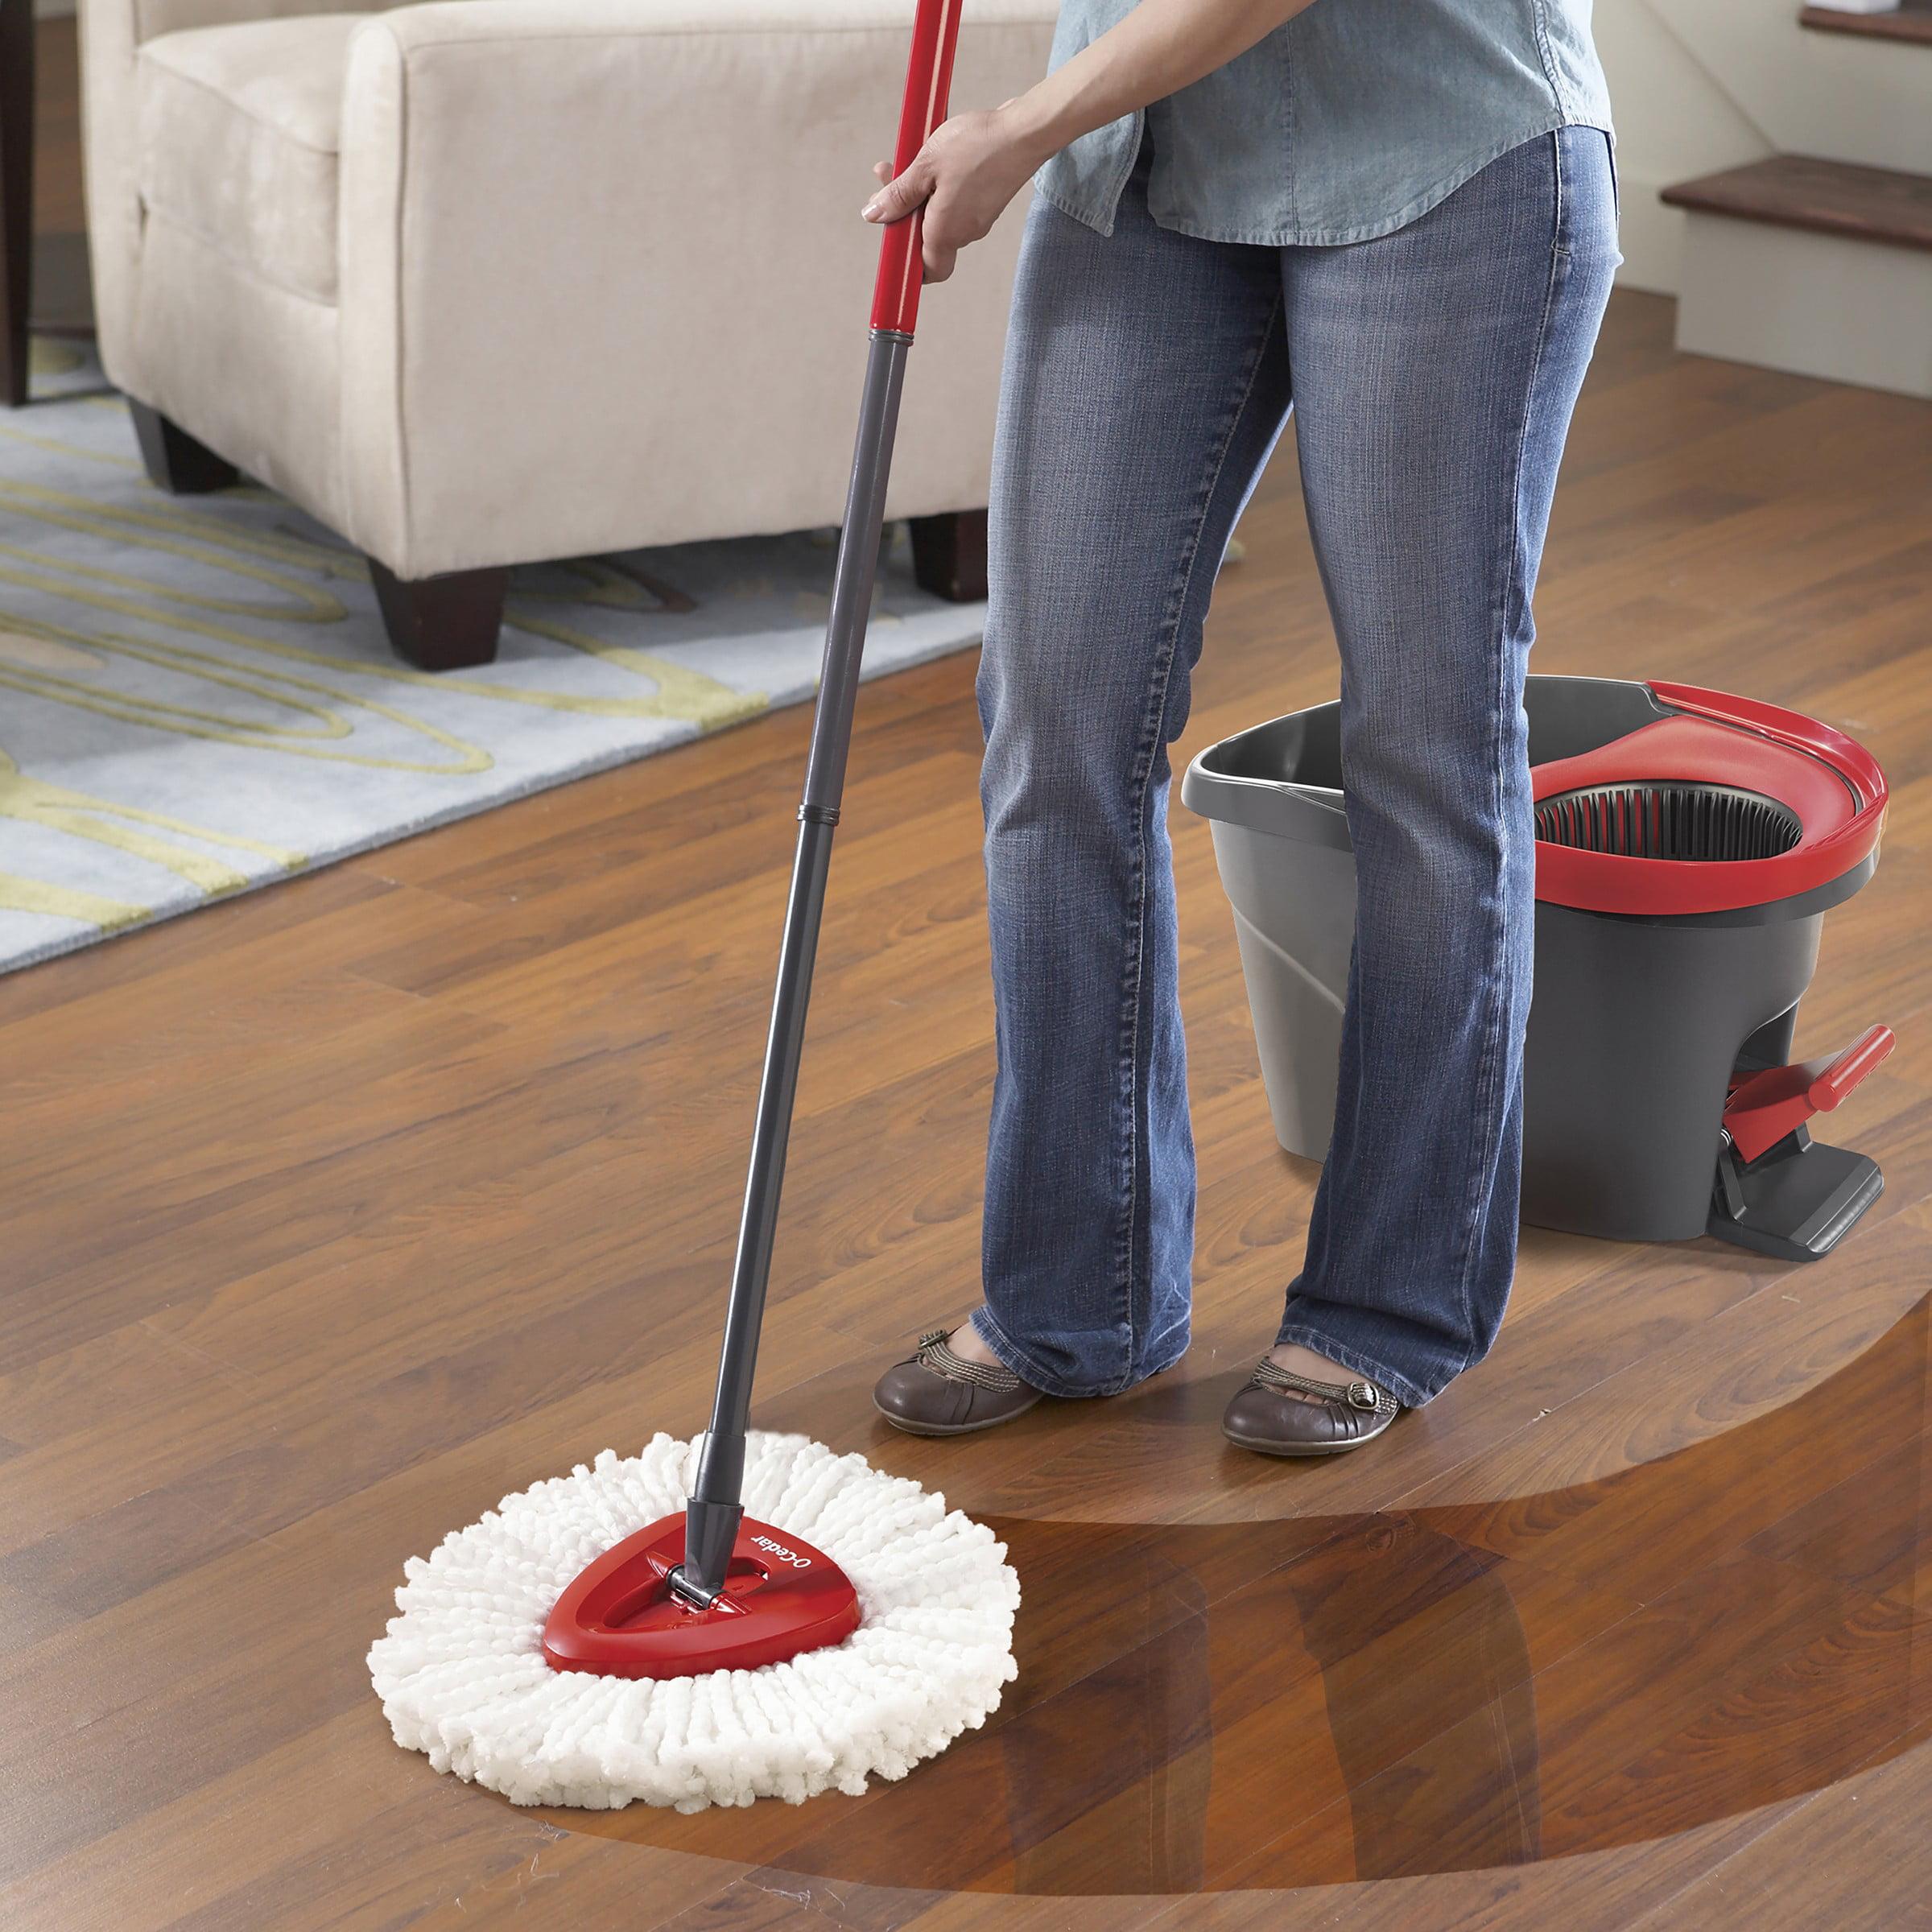 O Cedar Easywring Spin Mop Bucket System Walmart